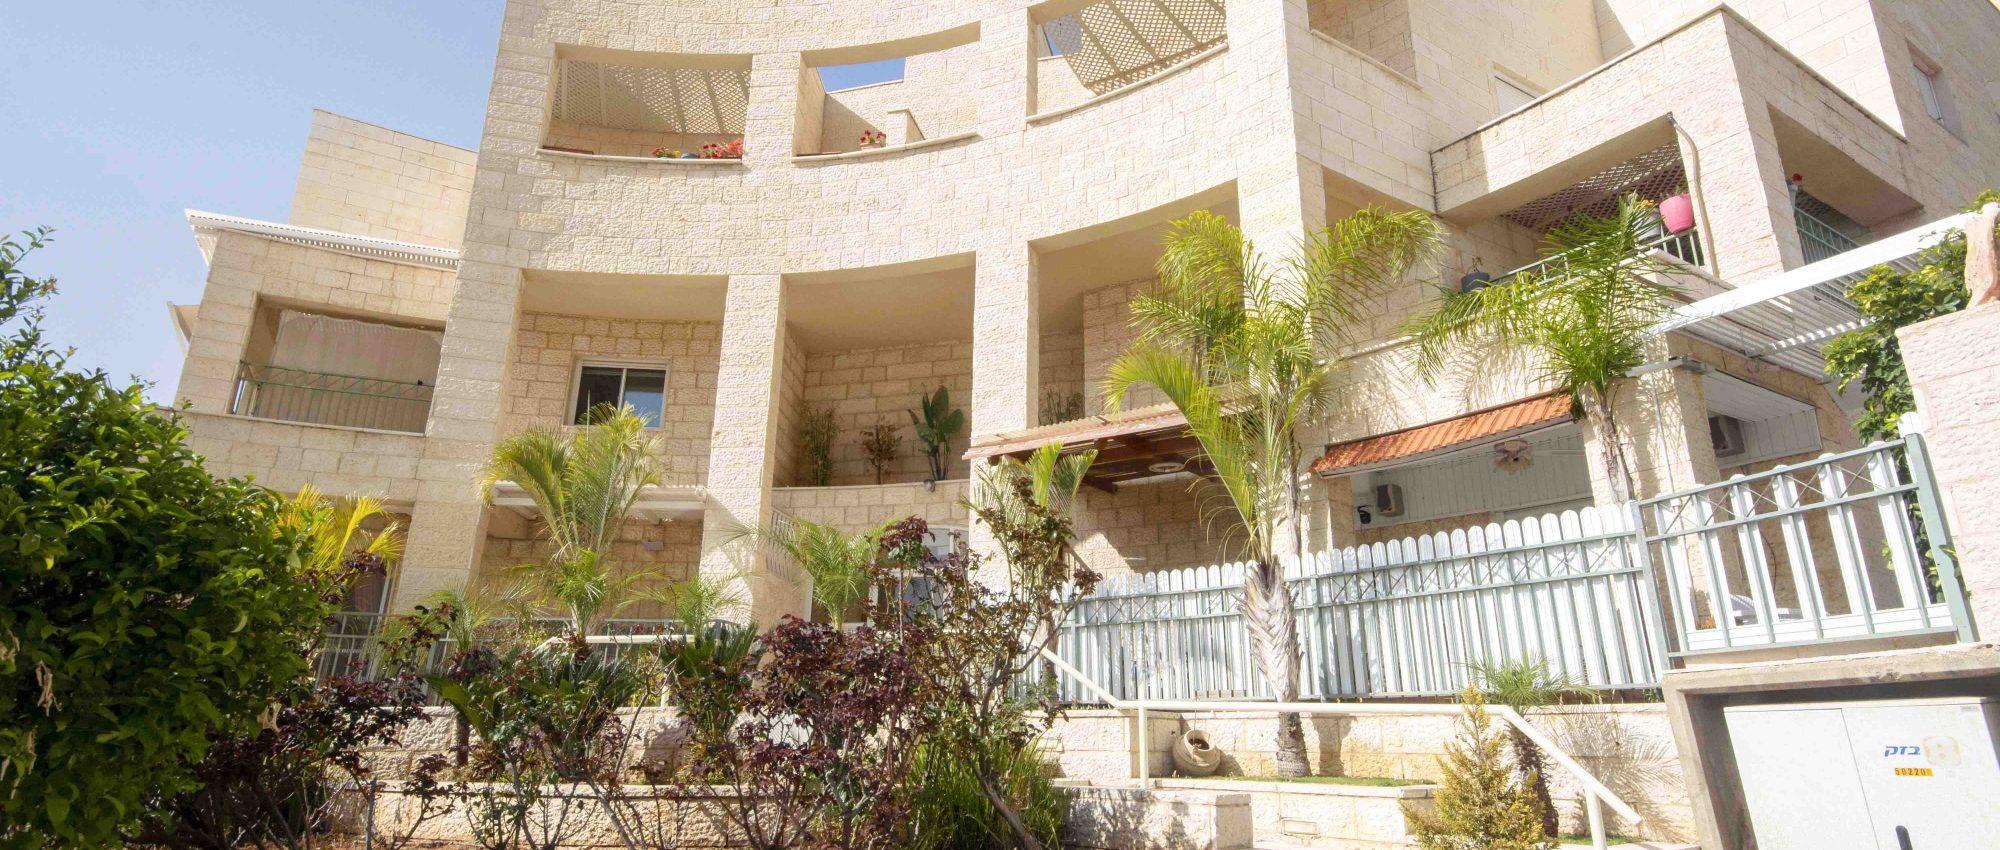 Exclusive – 4 Room Apartment for Sale in Emek Zvulan, Meginim, Modiin